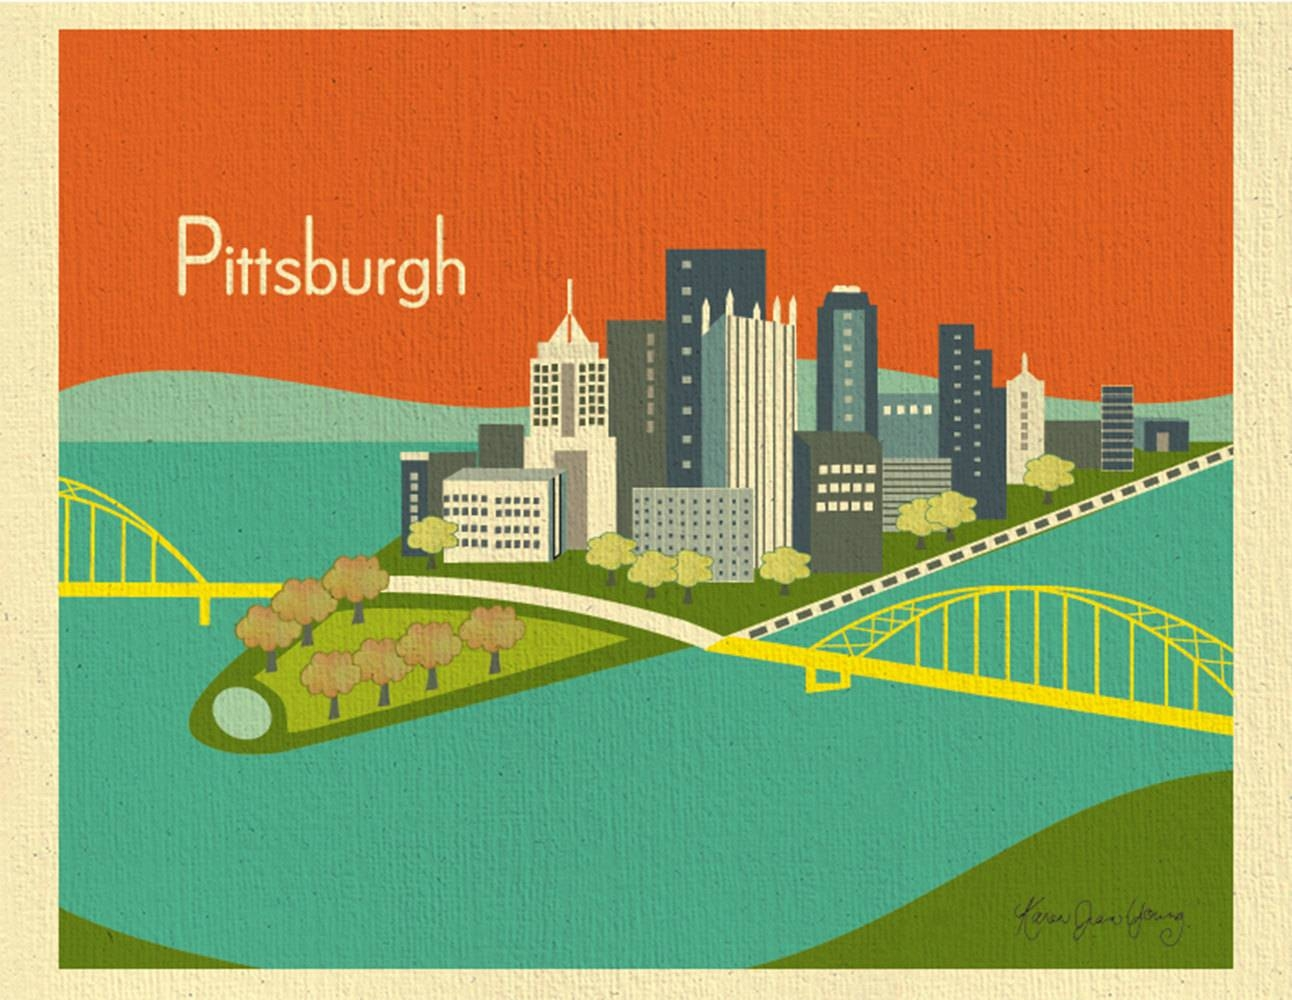 Pittsburgh Skyline Print Pittsburgh Wall Art Pittsburgh For Latest Pittsburgh Map Wall Art (View 16 of 20)